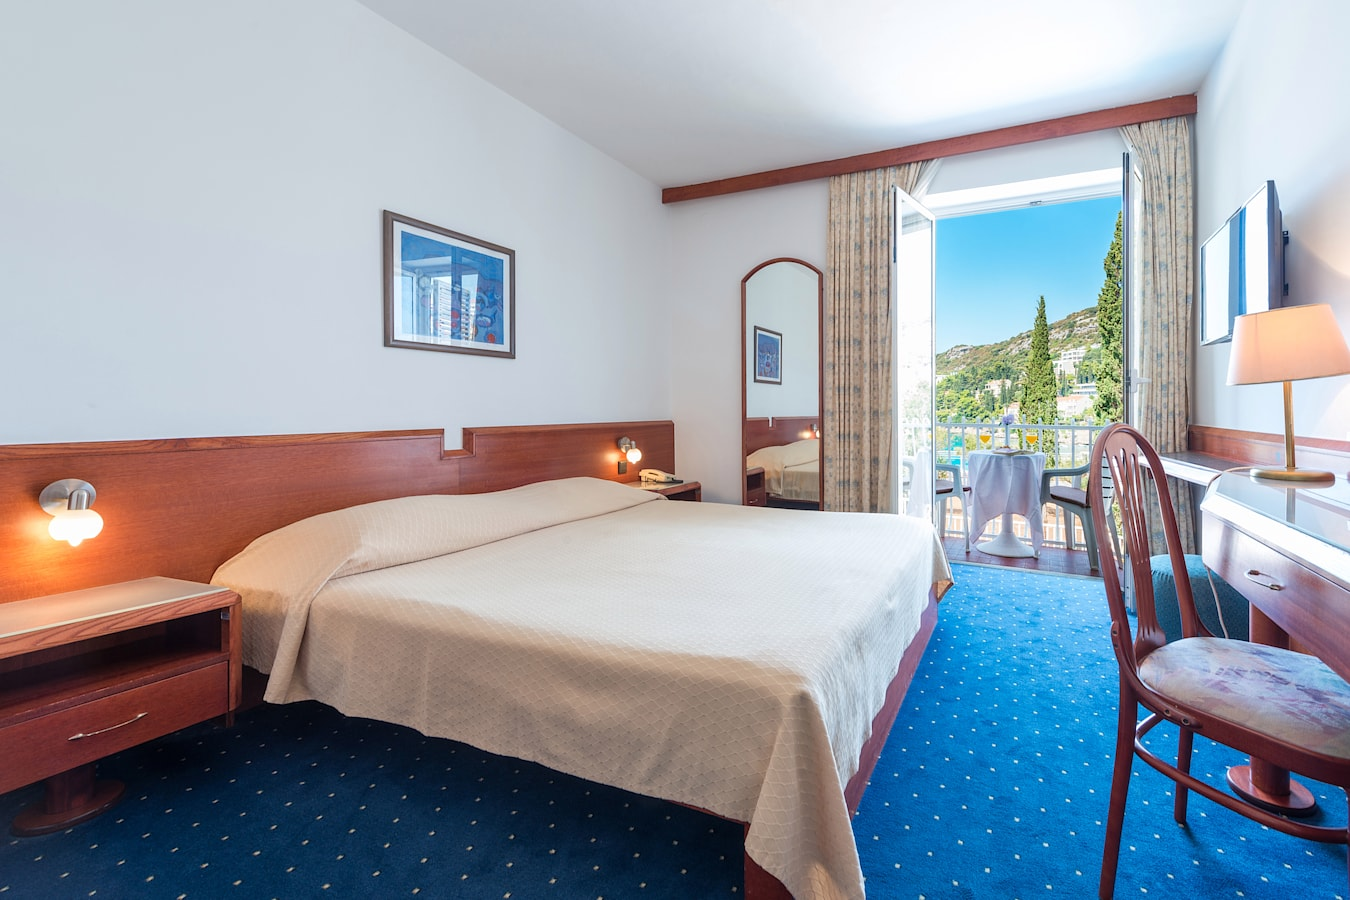 komodor-hotel-double-dubrovnik-room-balcony-seaview.jpg